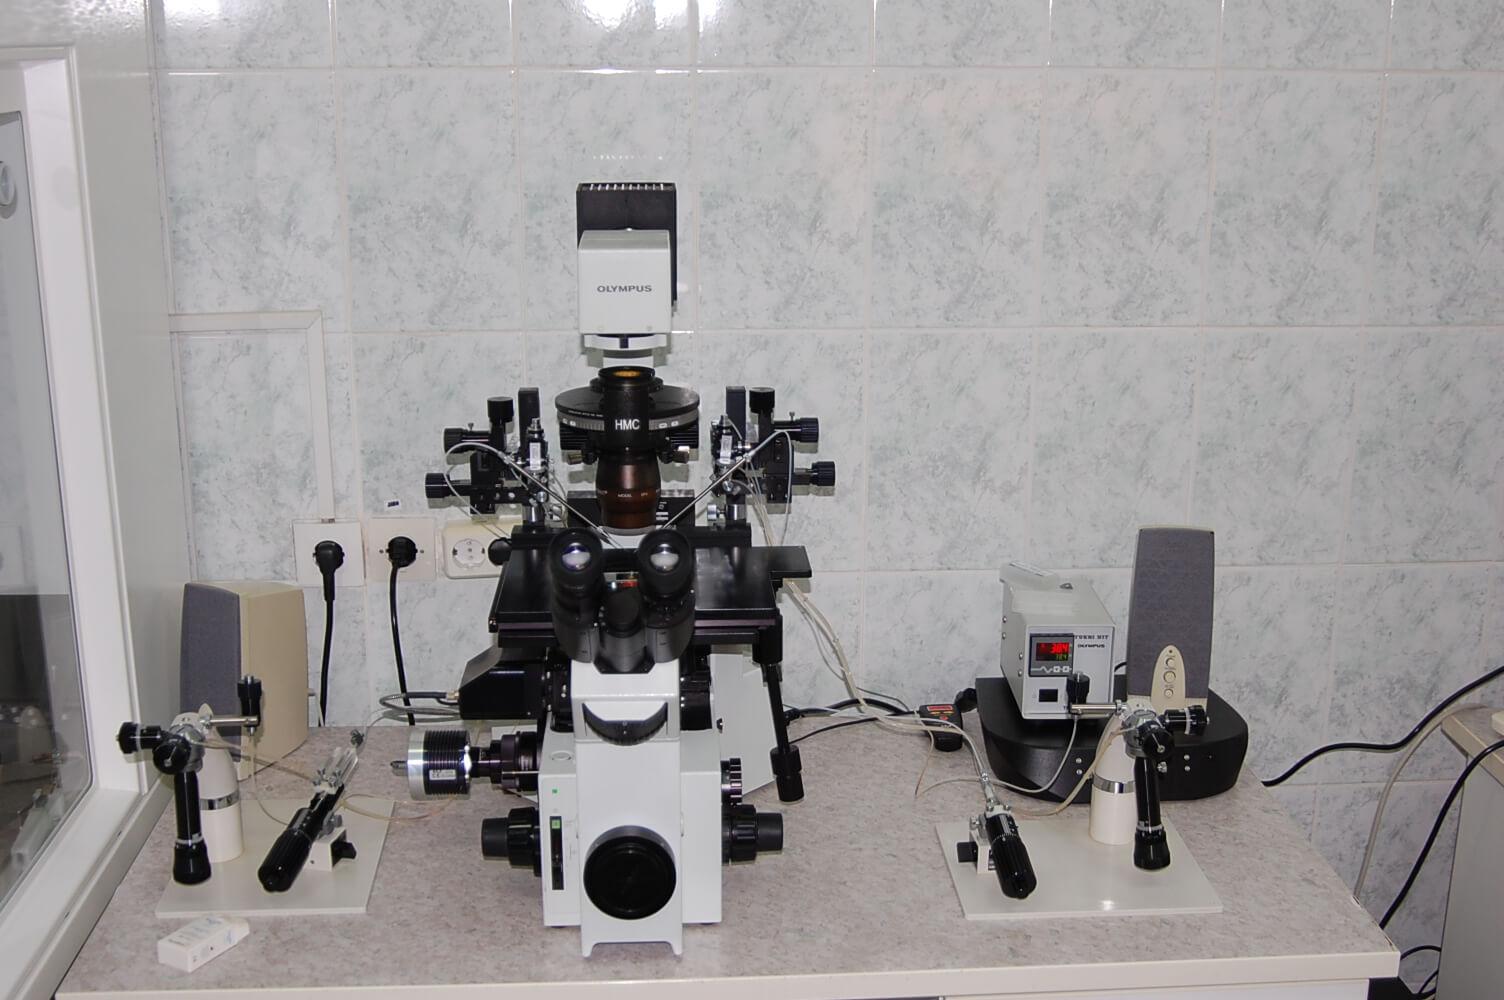 adresa-laboratorii-v-moskve-spermogramma